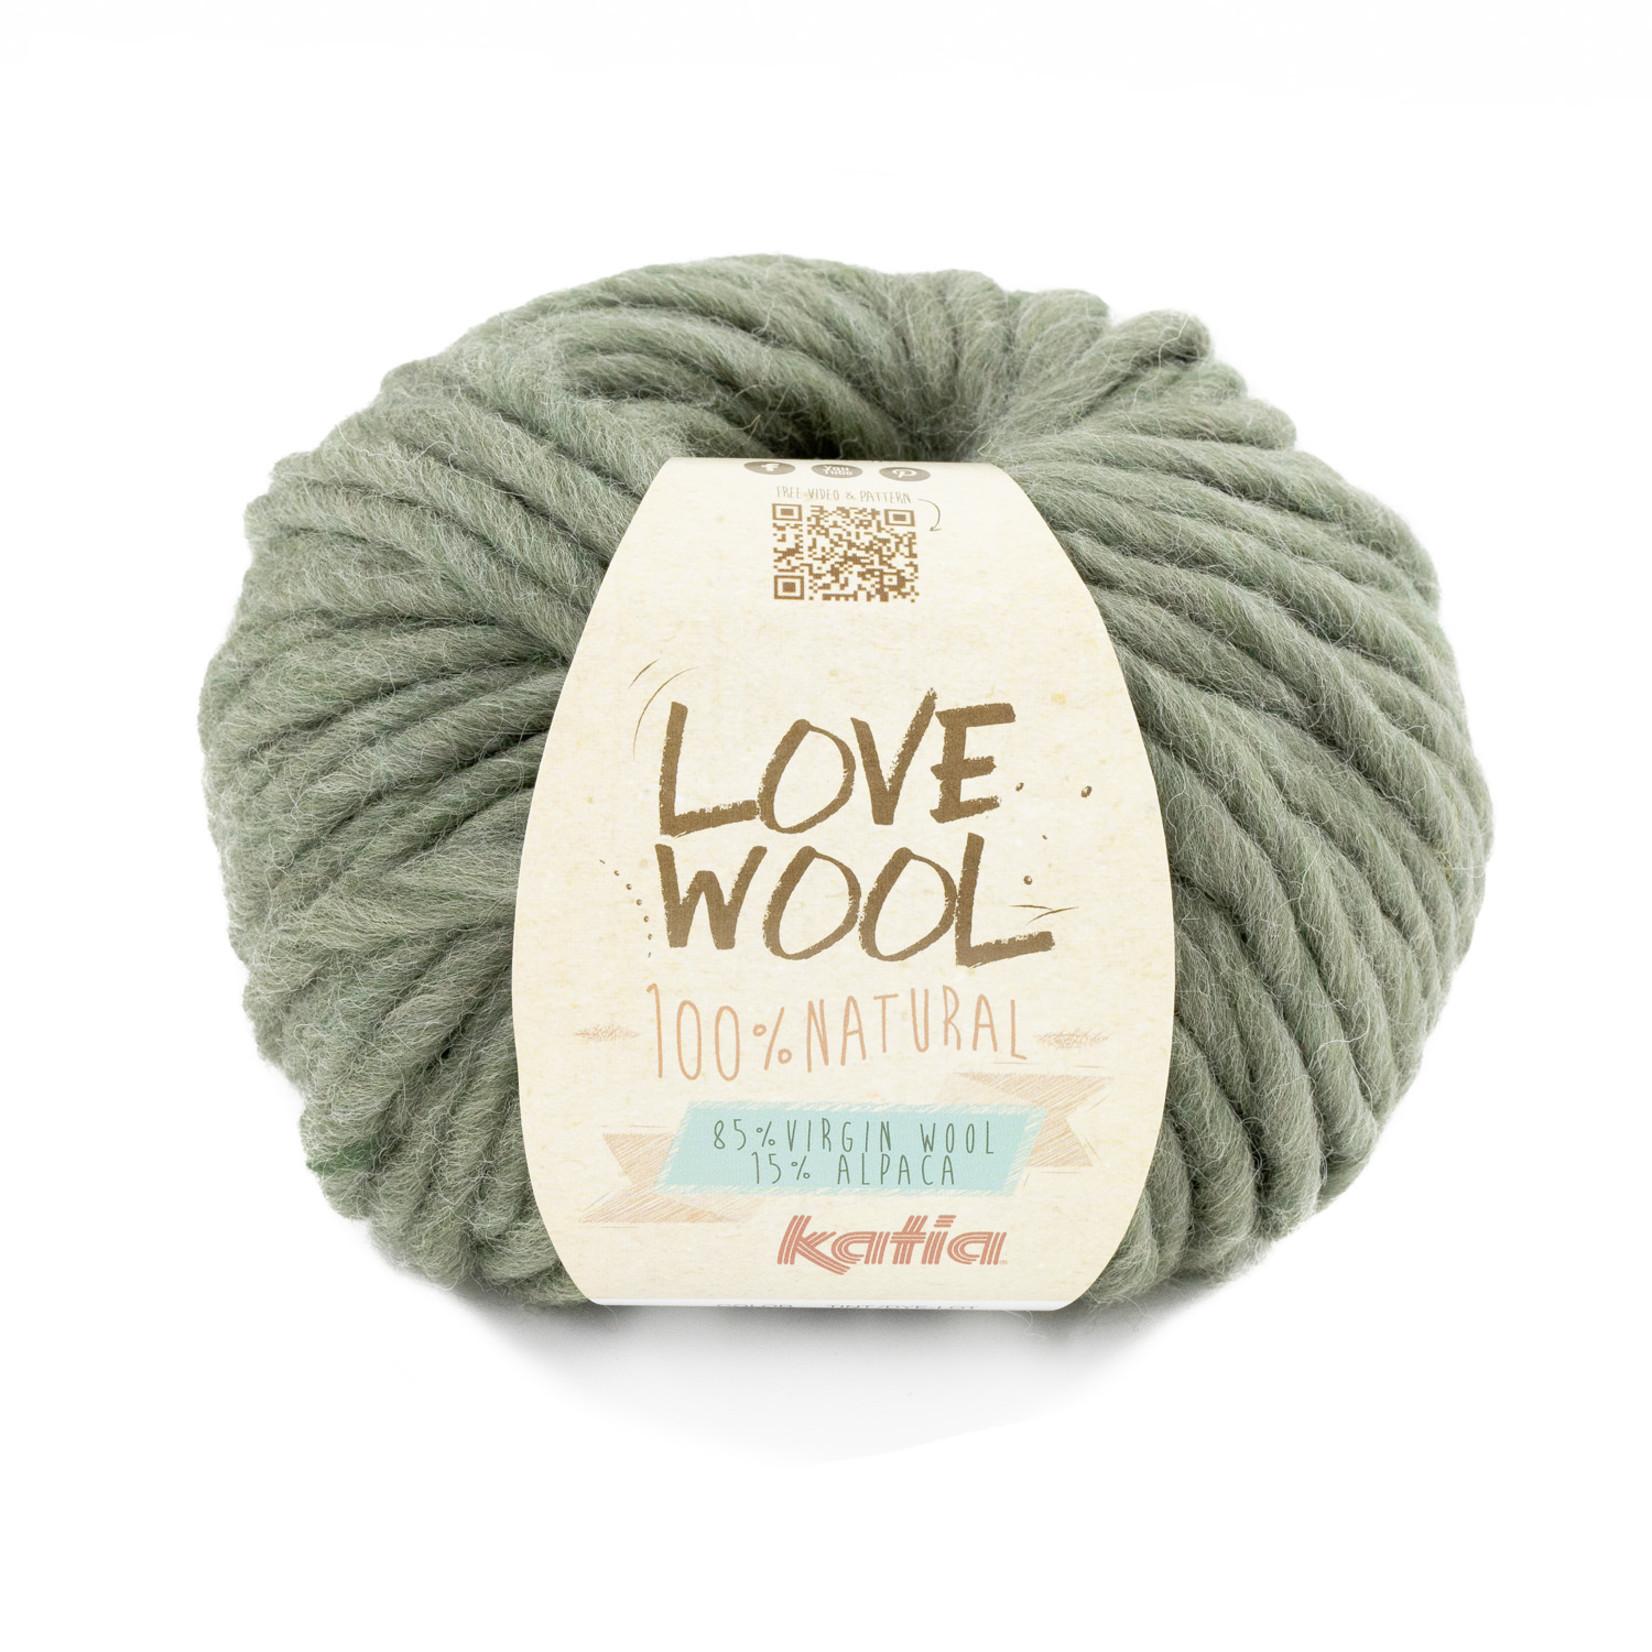 Katia Katia - Love Wool - kleur 127 - Resedagroen - 100 gr. = 50 m.